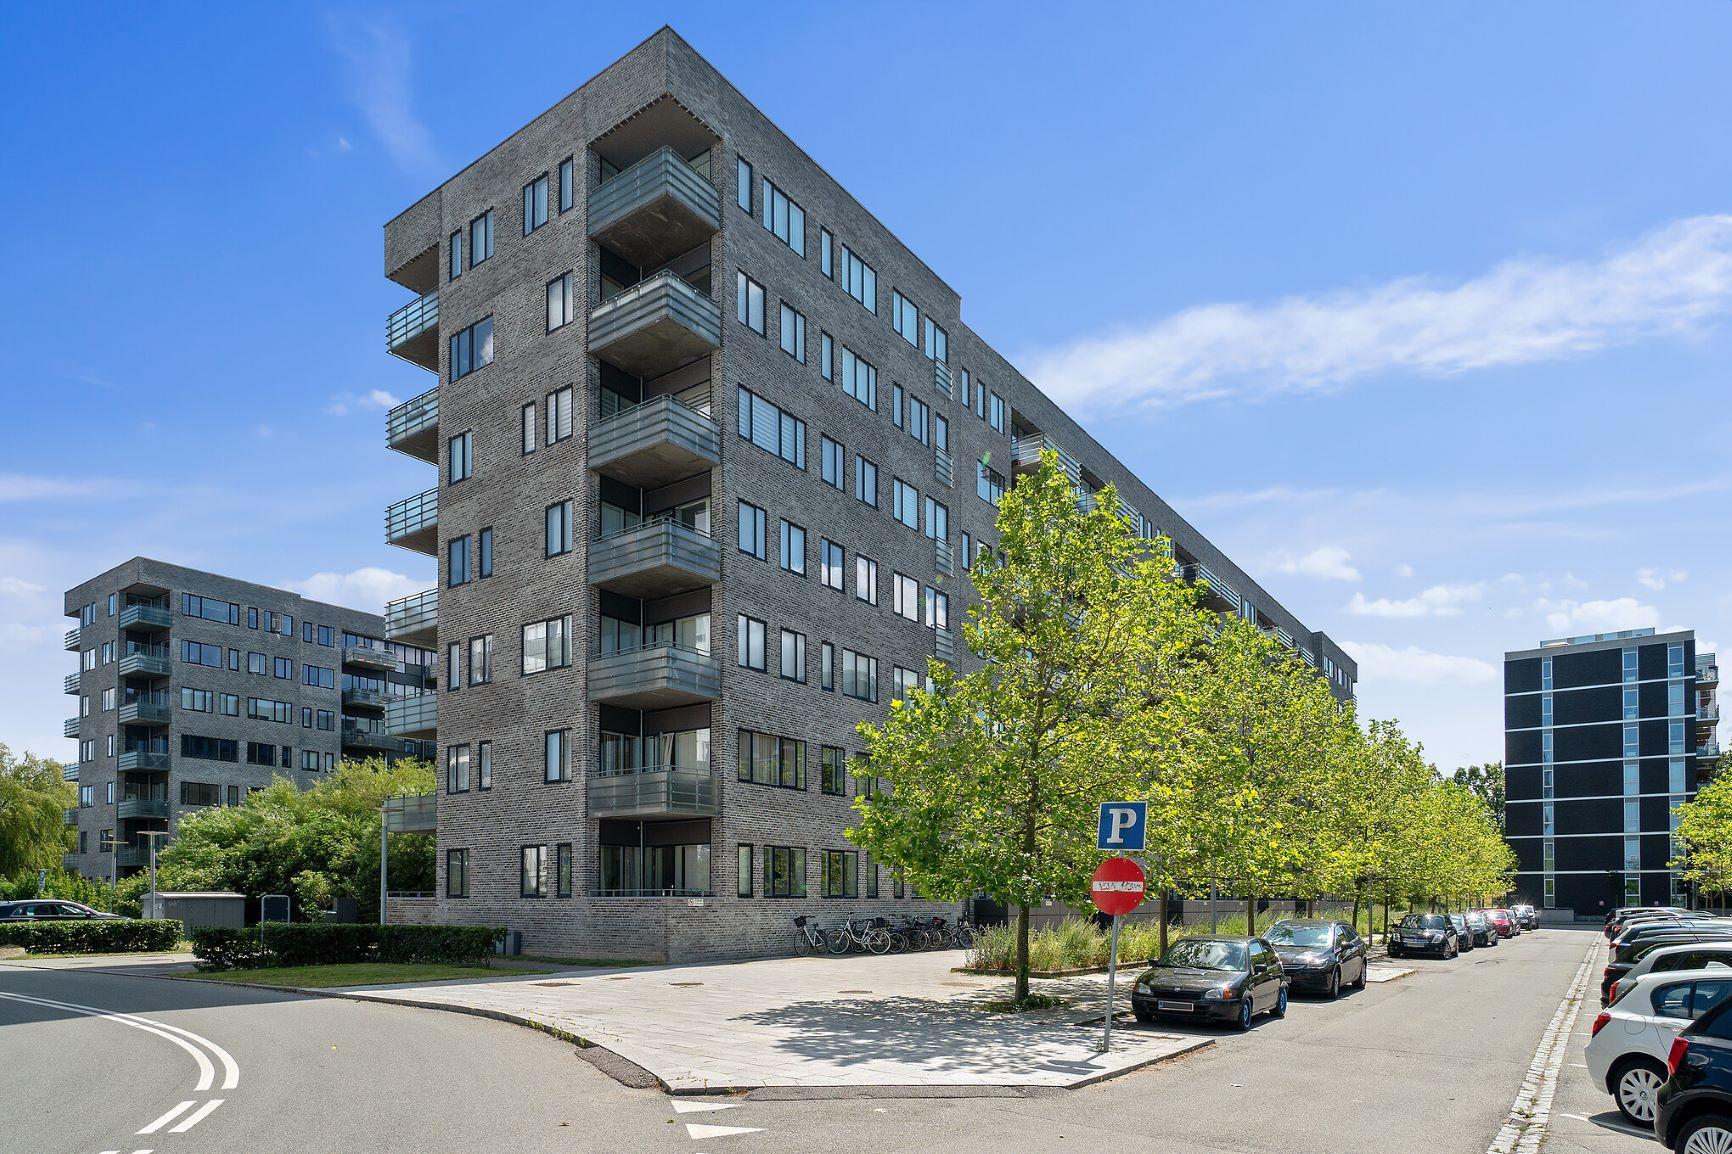 Lejebolig på Gyngemose Parkvej 24, 4. th., 2860 Søborg